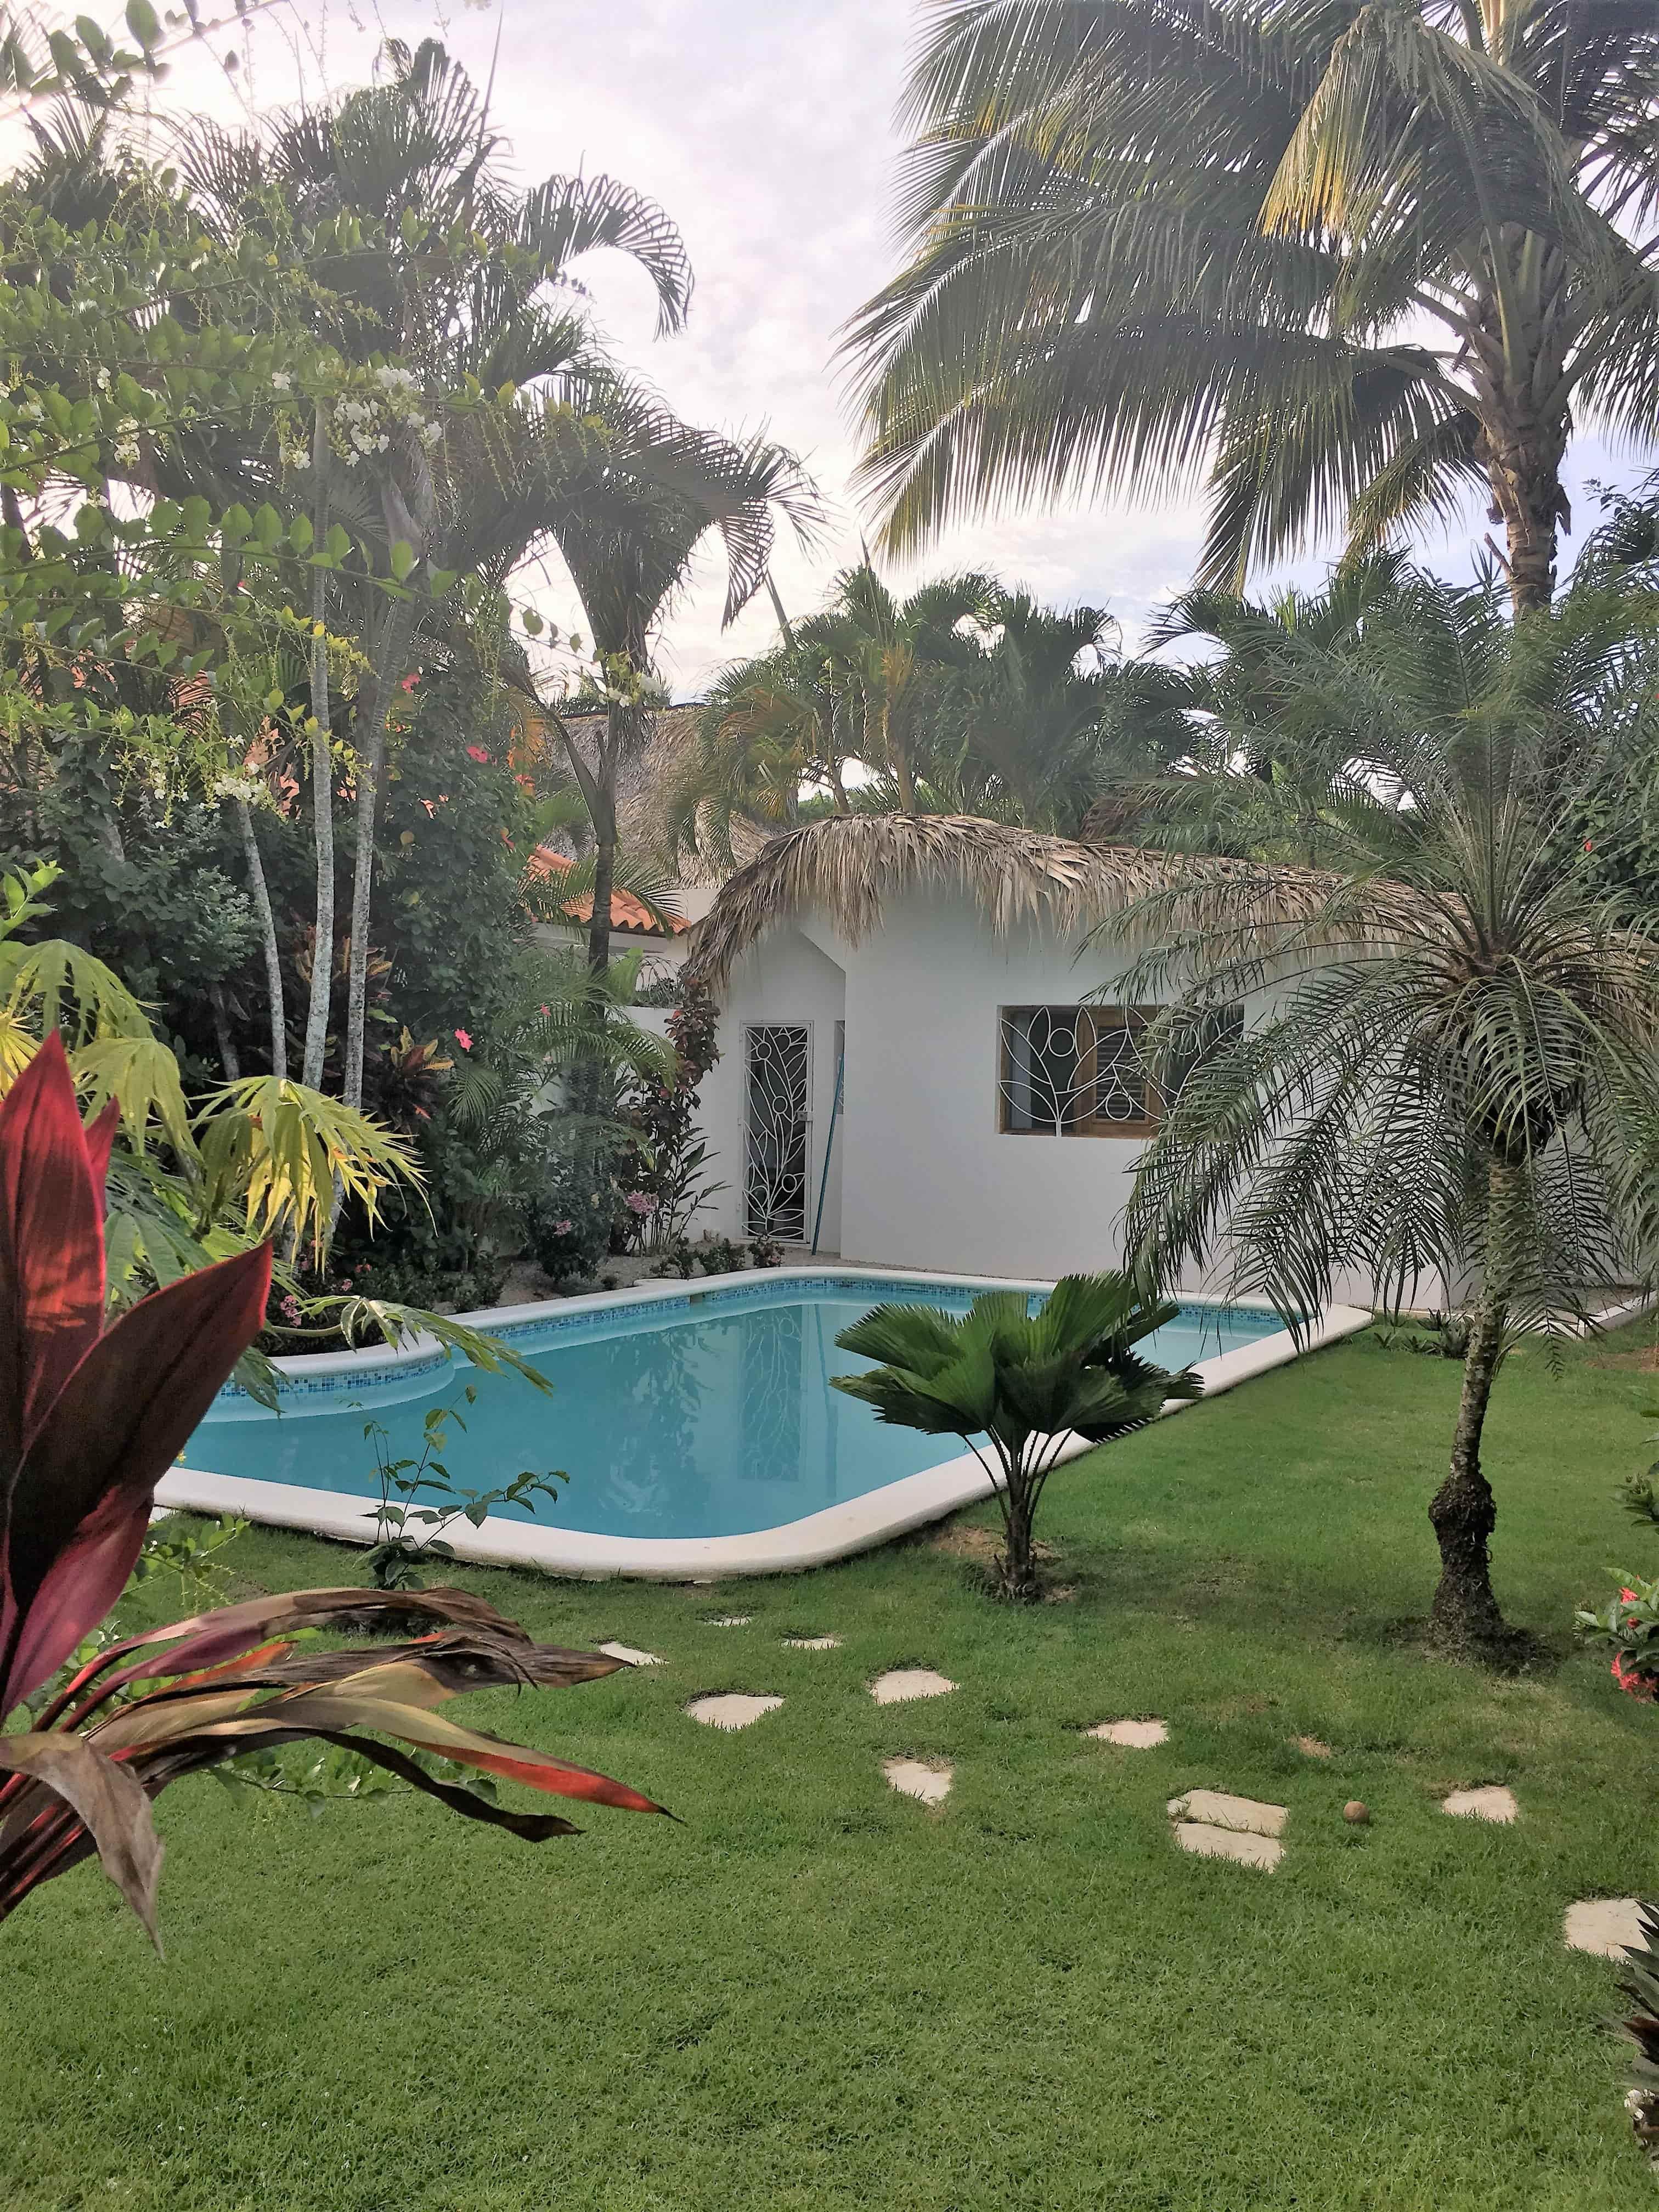 VILLAS FLORENZO - $319,000 USD - 3 BED 3 BATH VILLA, PRIVATE POOL & GARDEN CASITA - C604LT